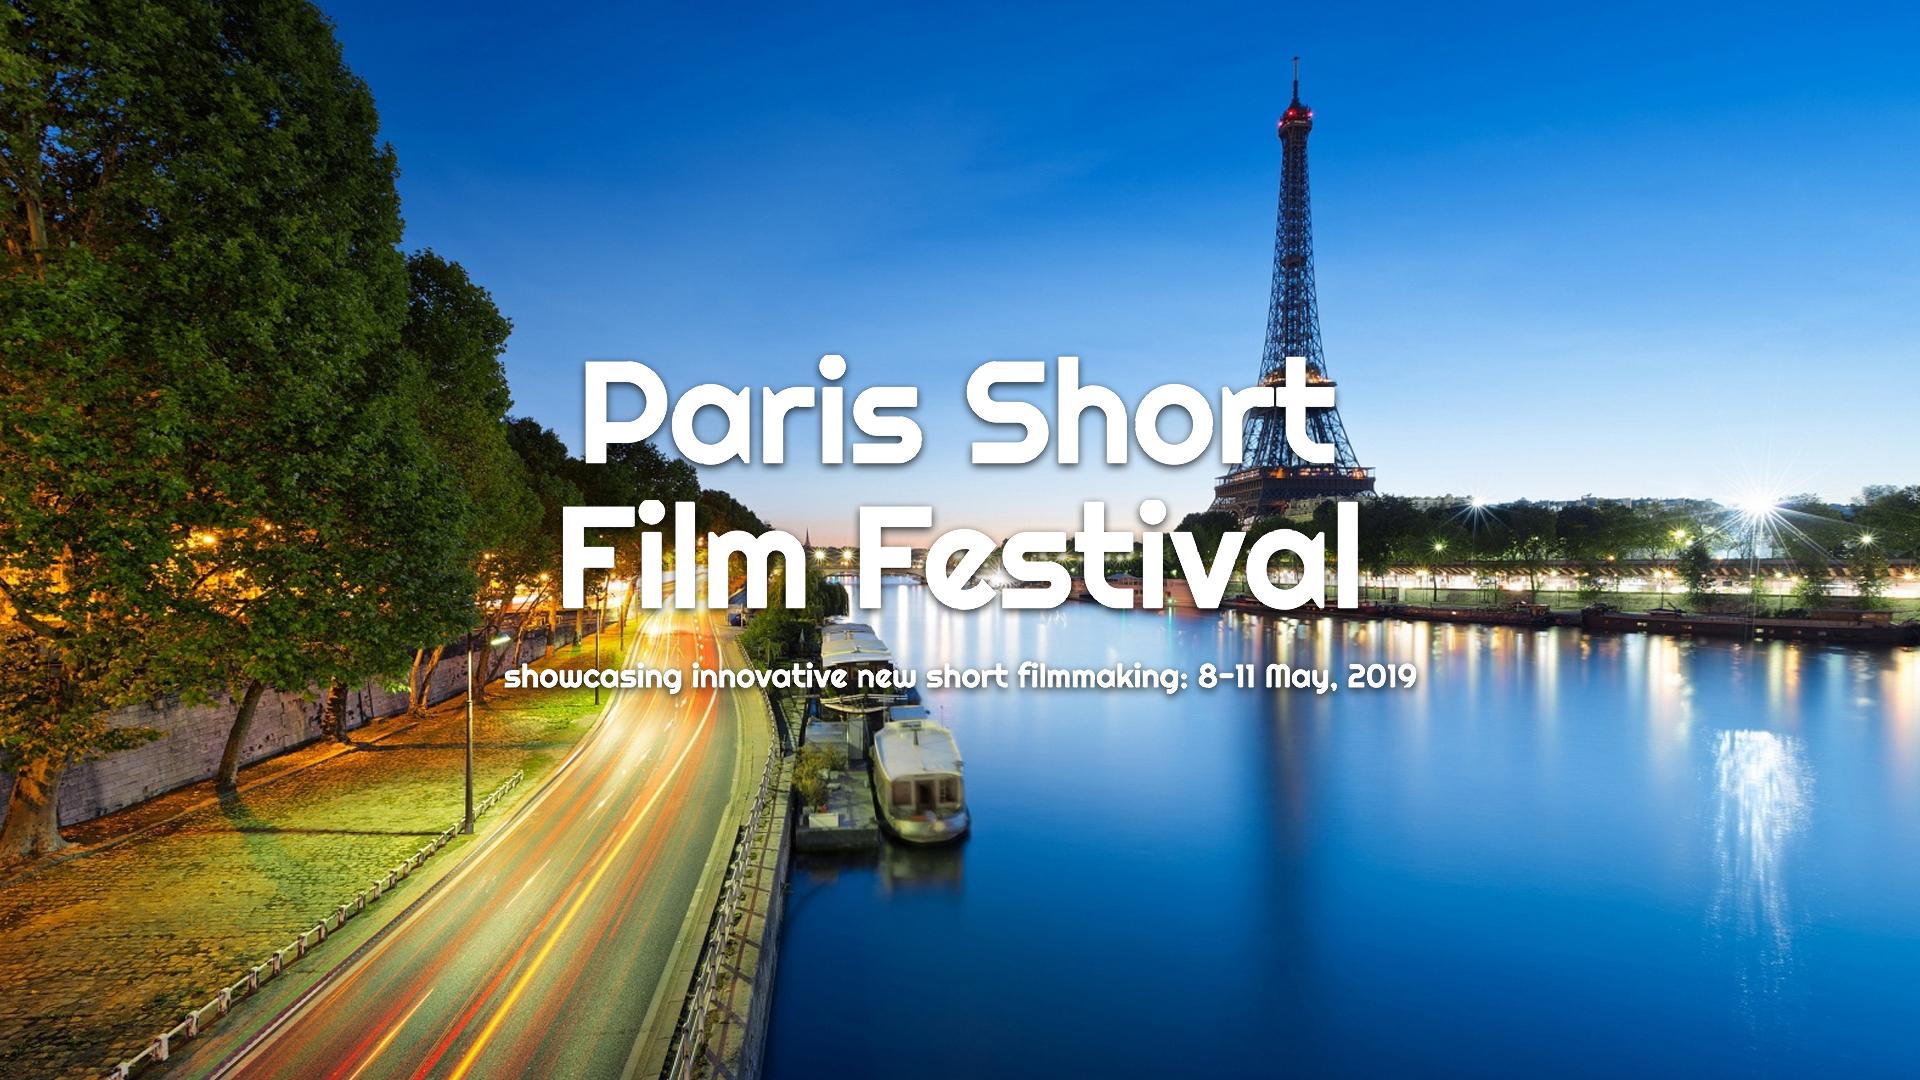 Paris-Short-Film-Festival-2019.jpg